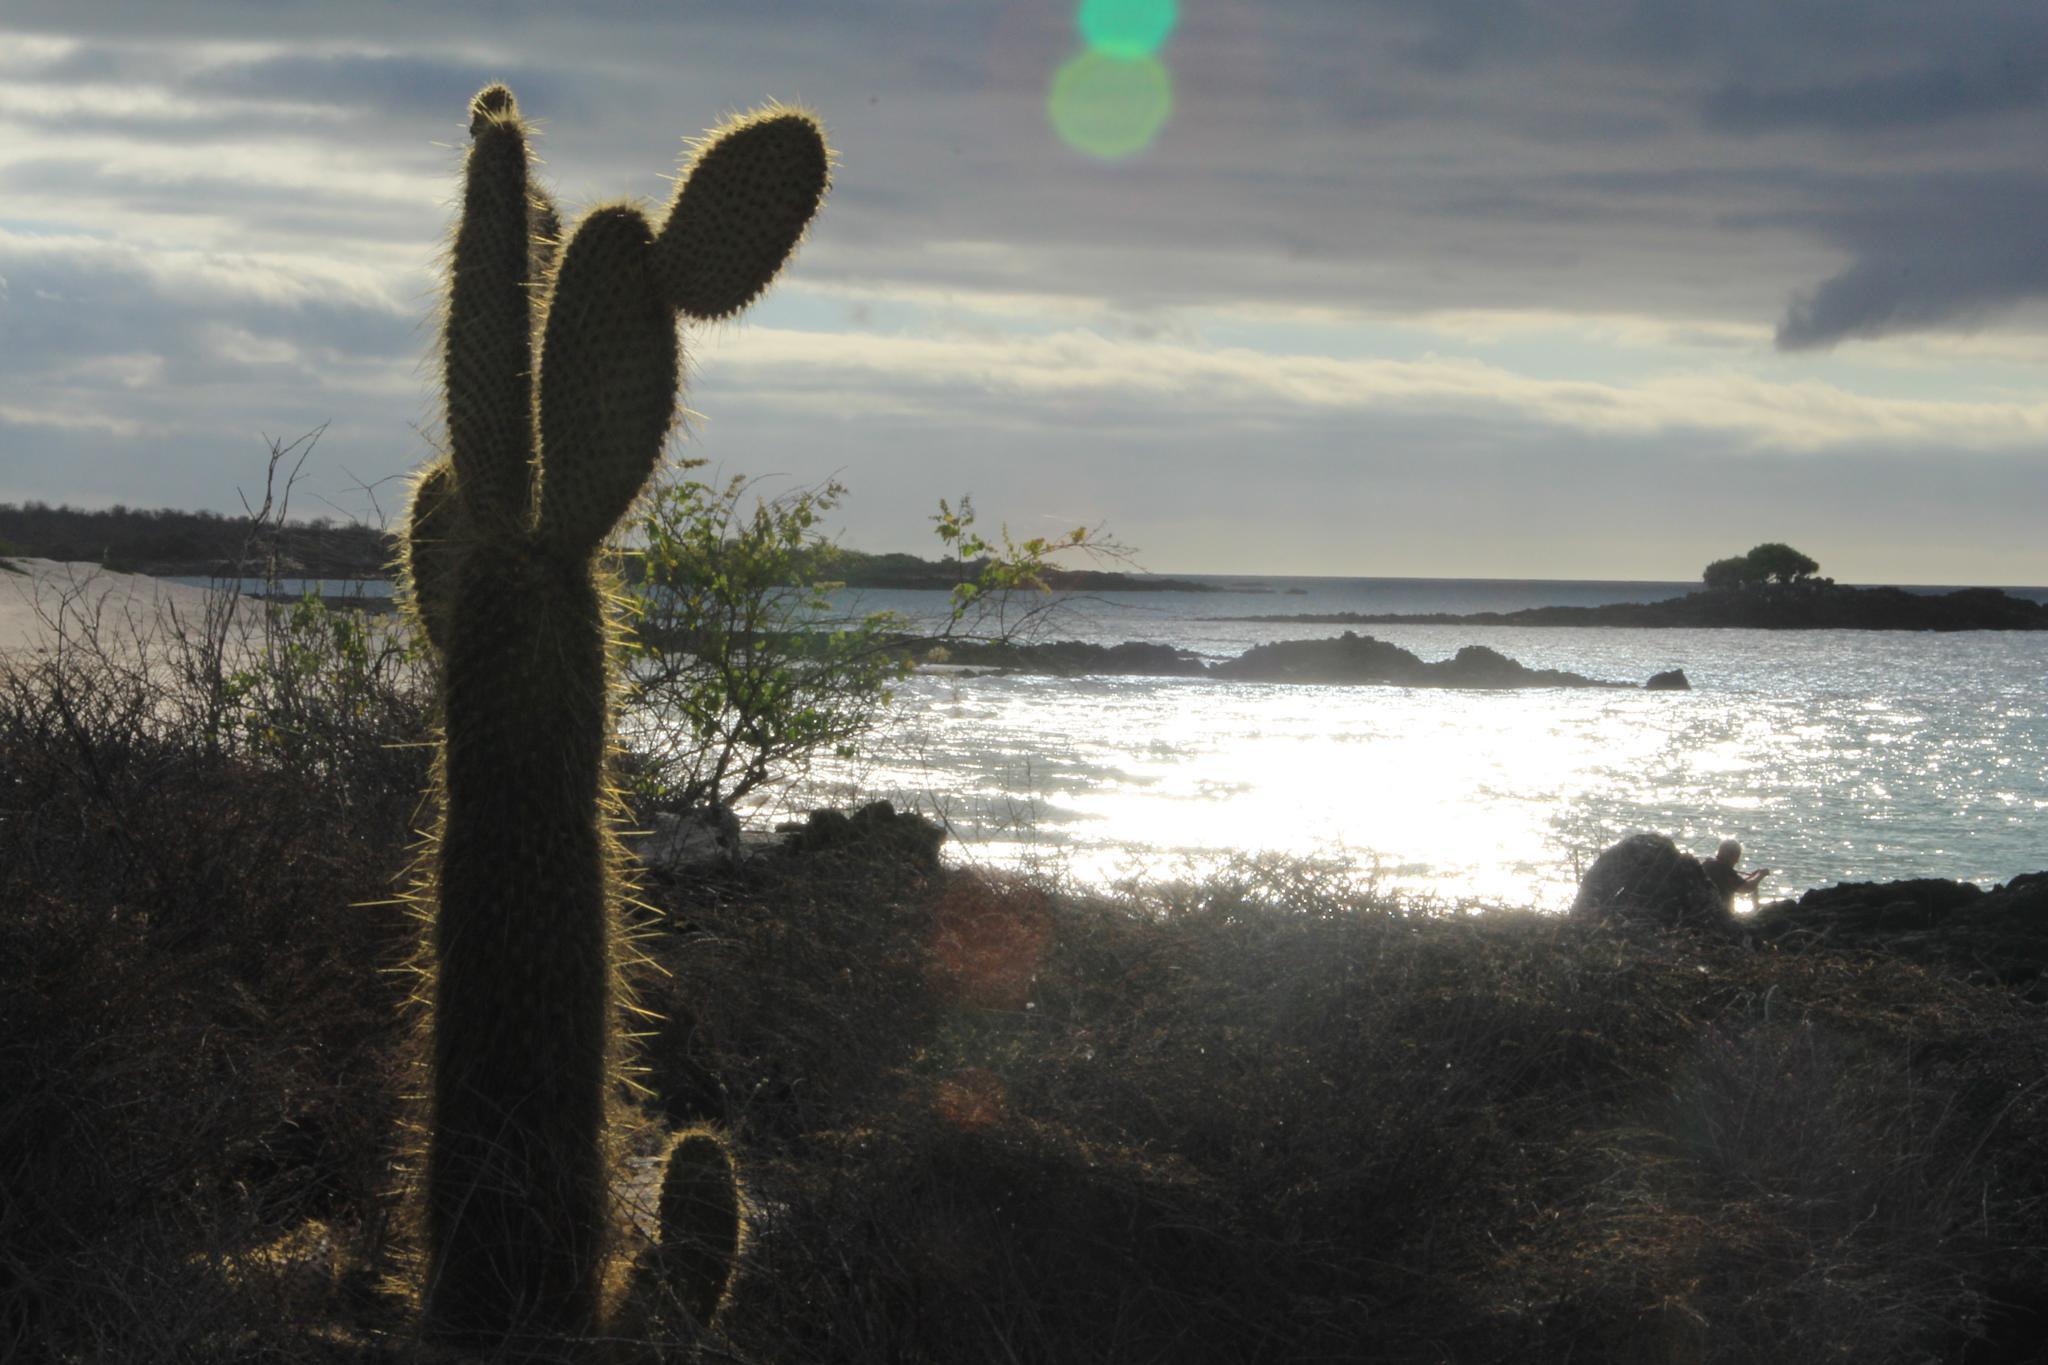 Island Cactus by robin.smith.3150